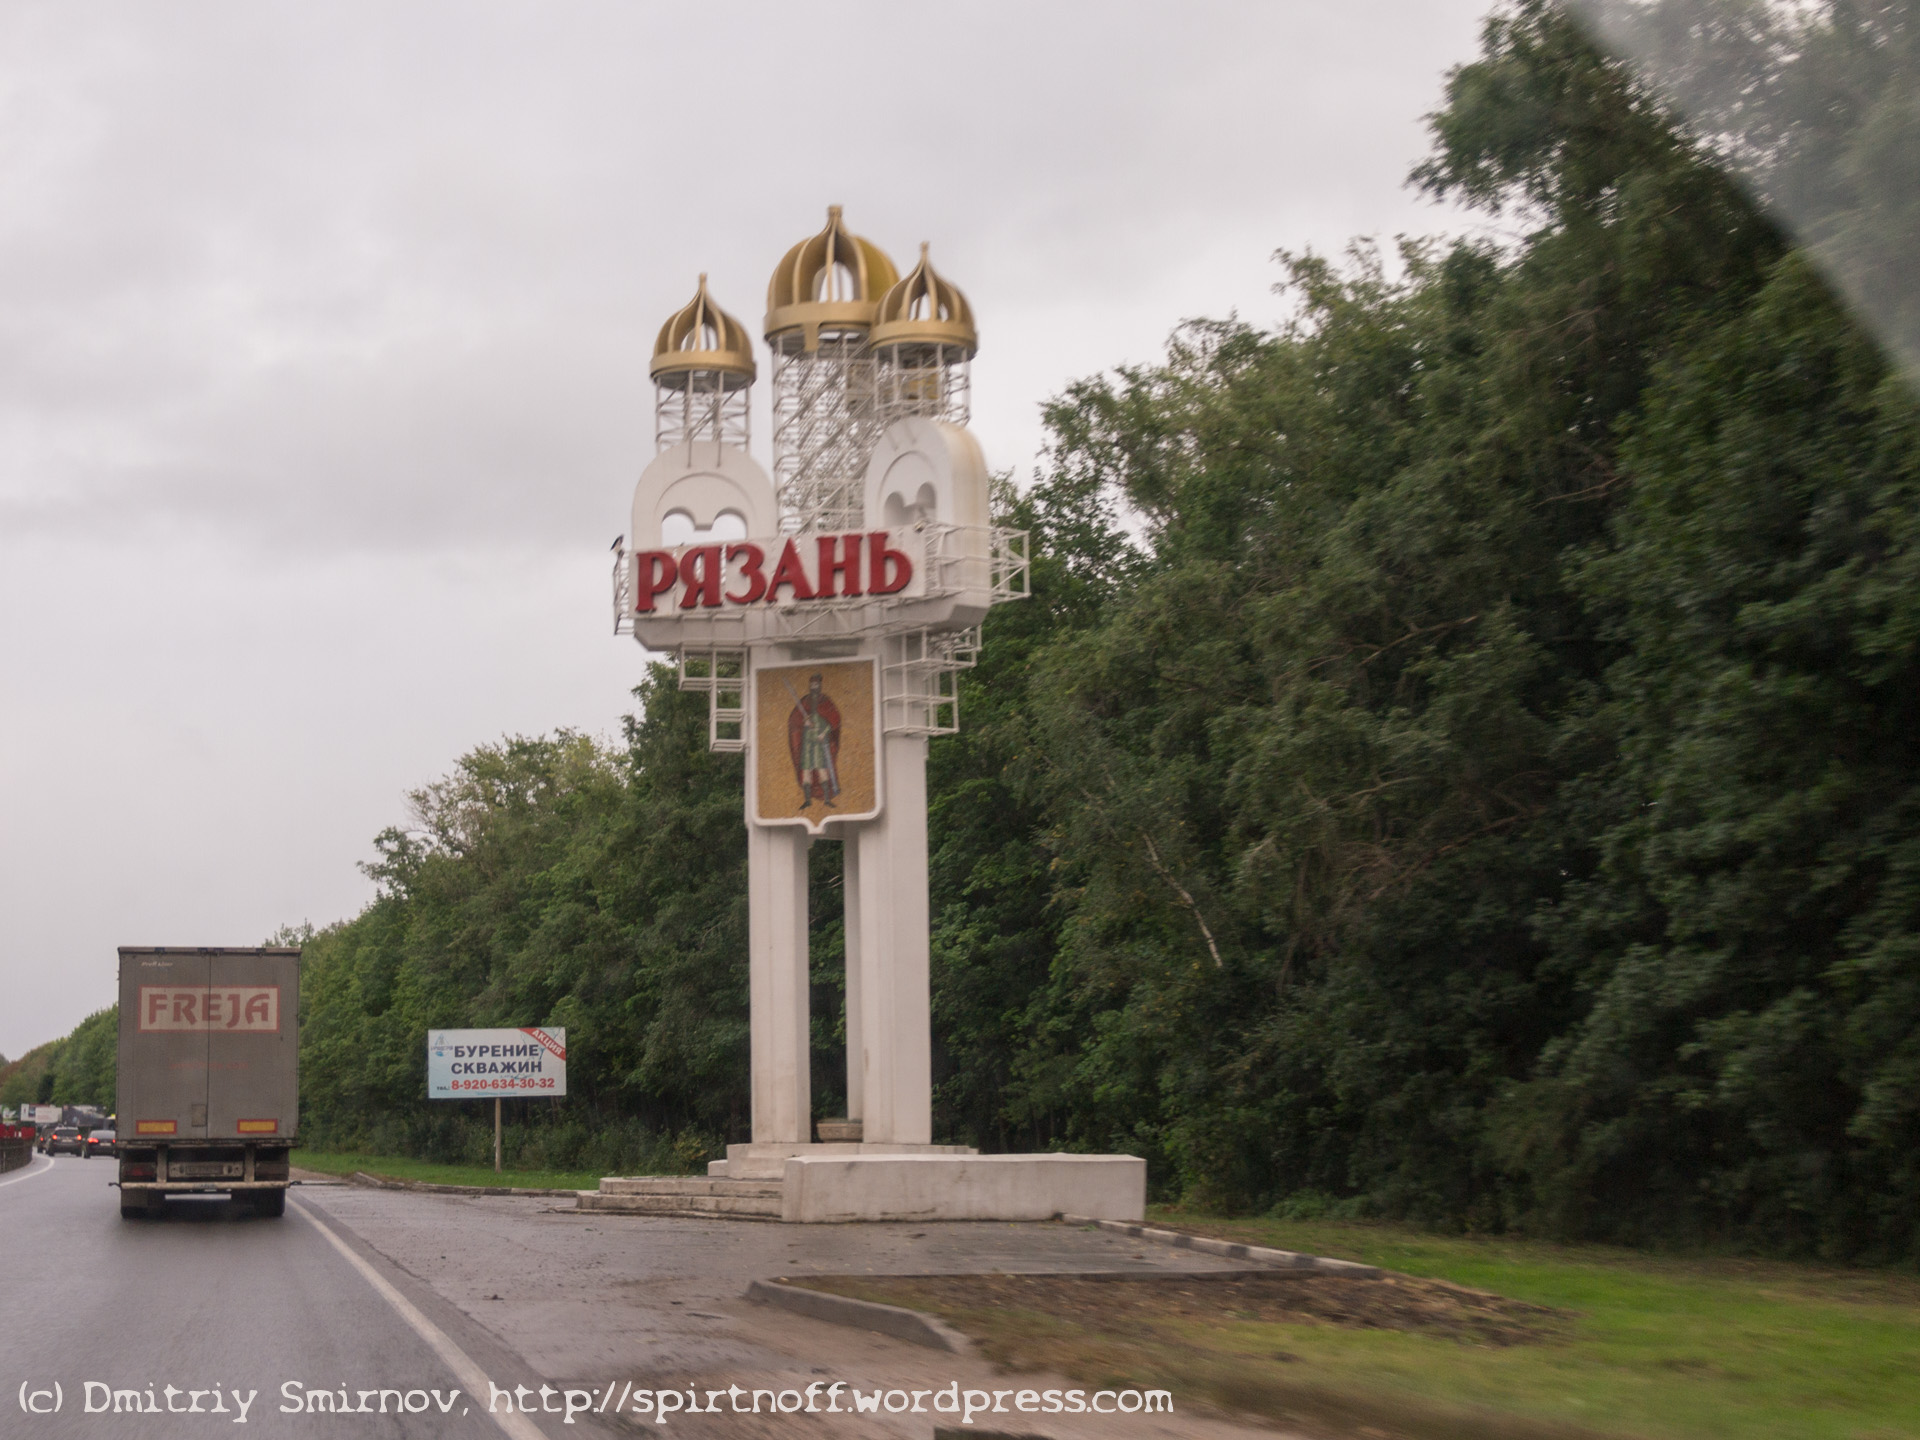 blog-2-of-59 Путешествия  Рязань. Город темных фонарей